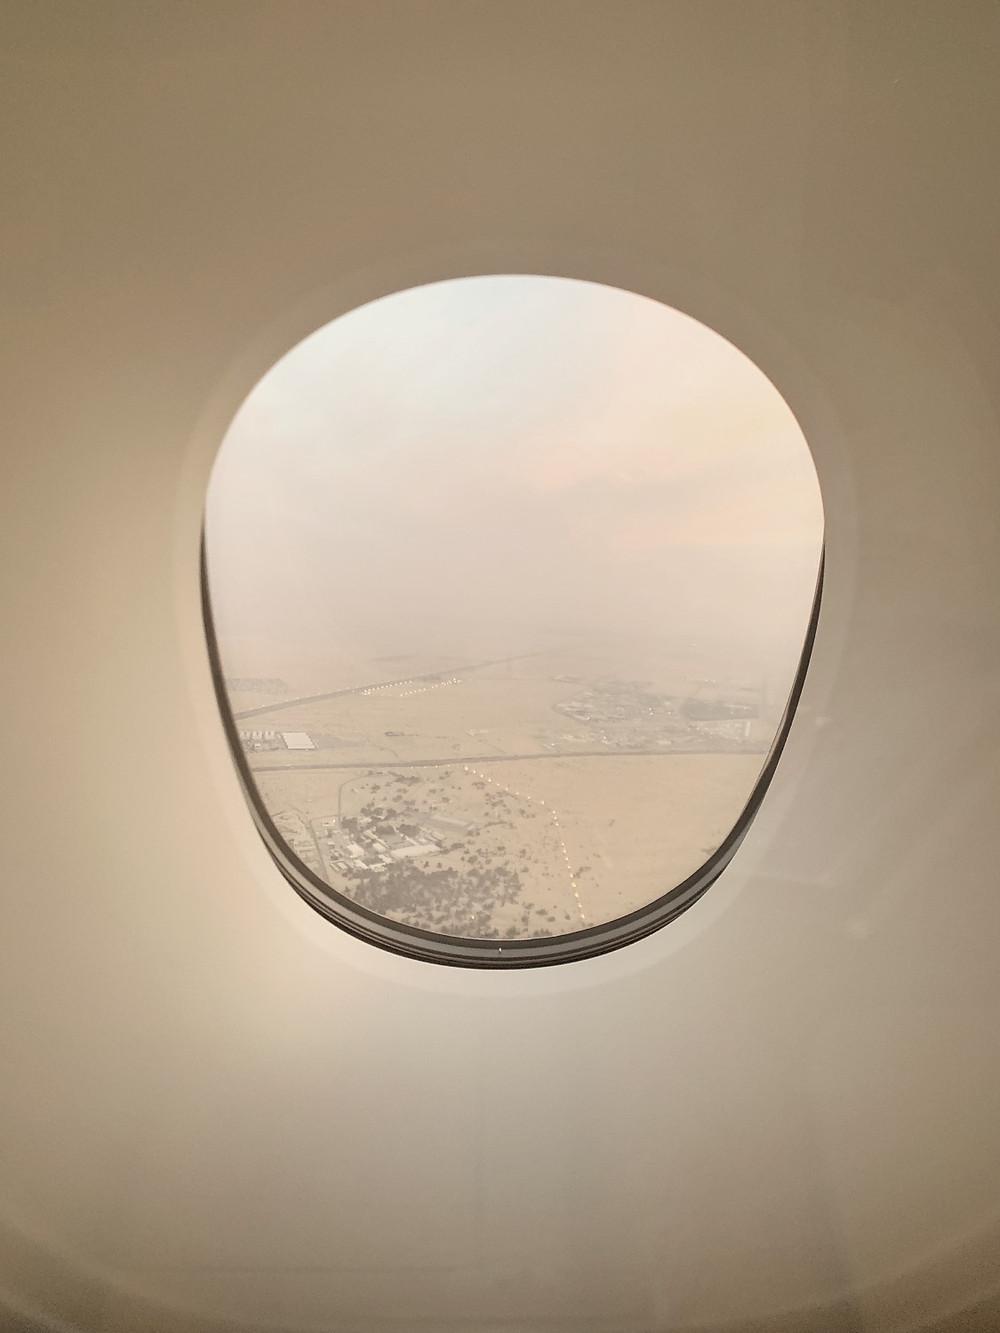 Emirates First Class San Francisco - Dubai, Arrival Views